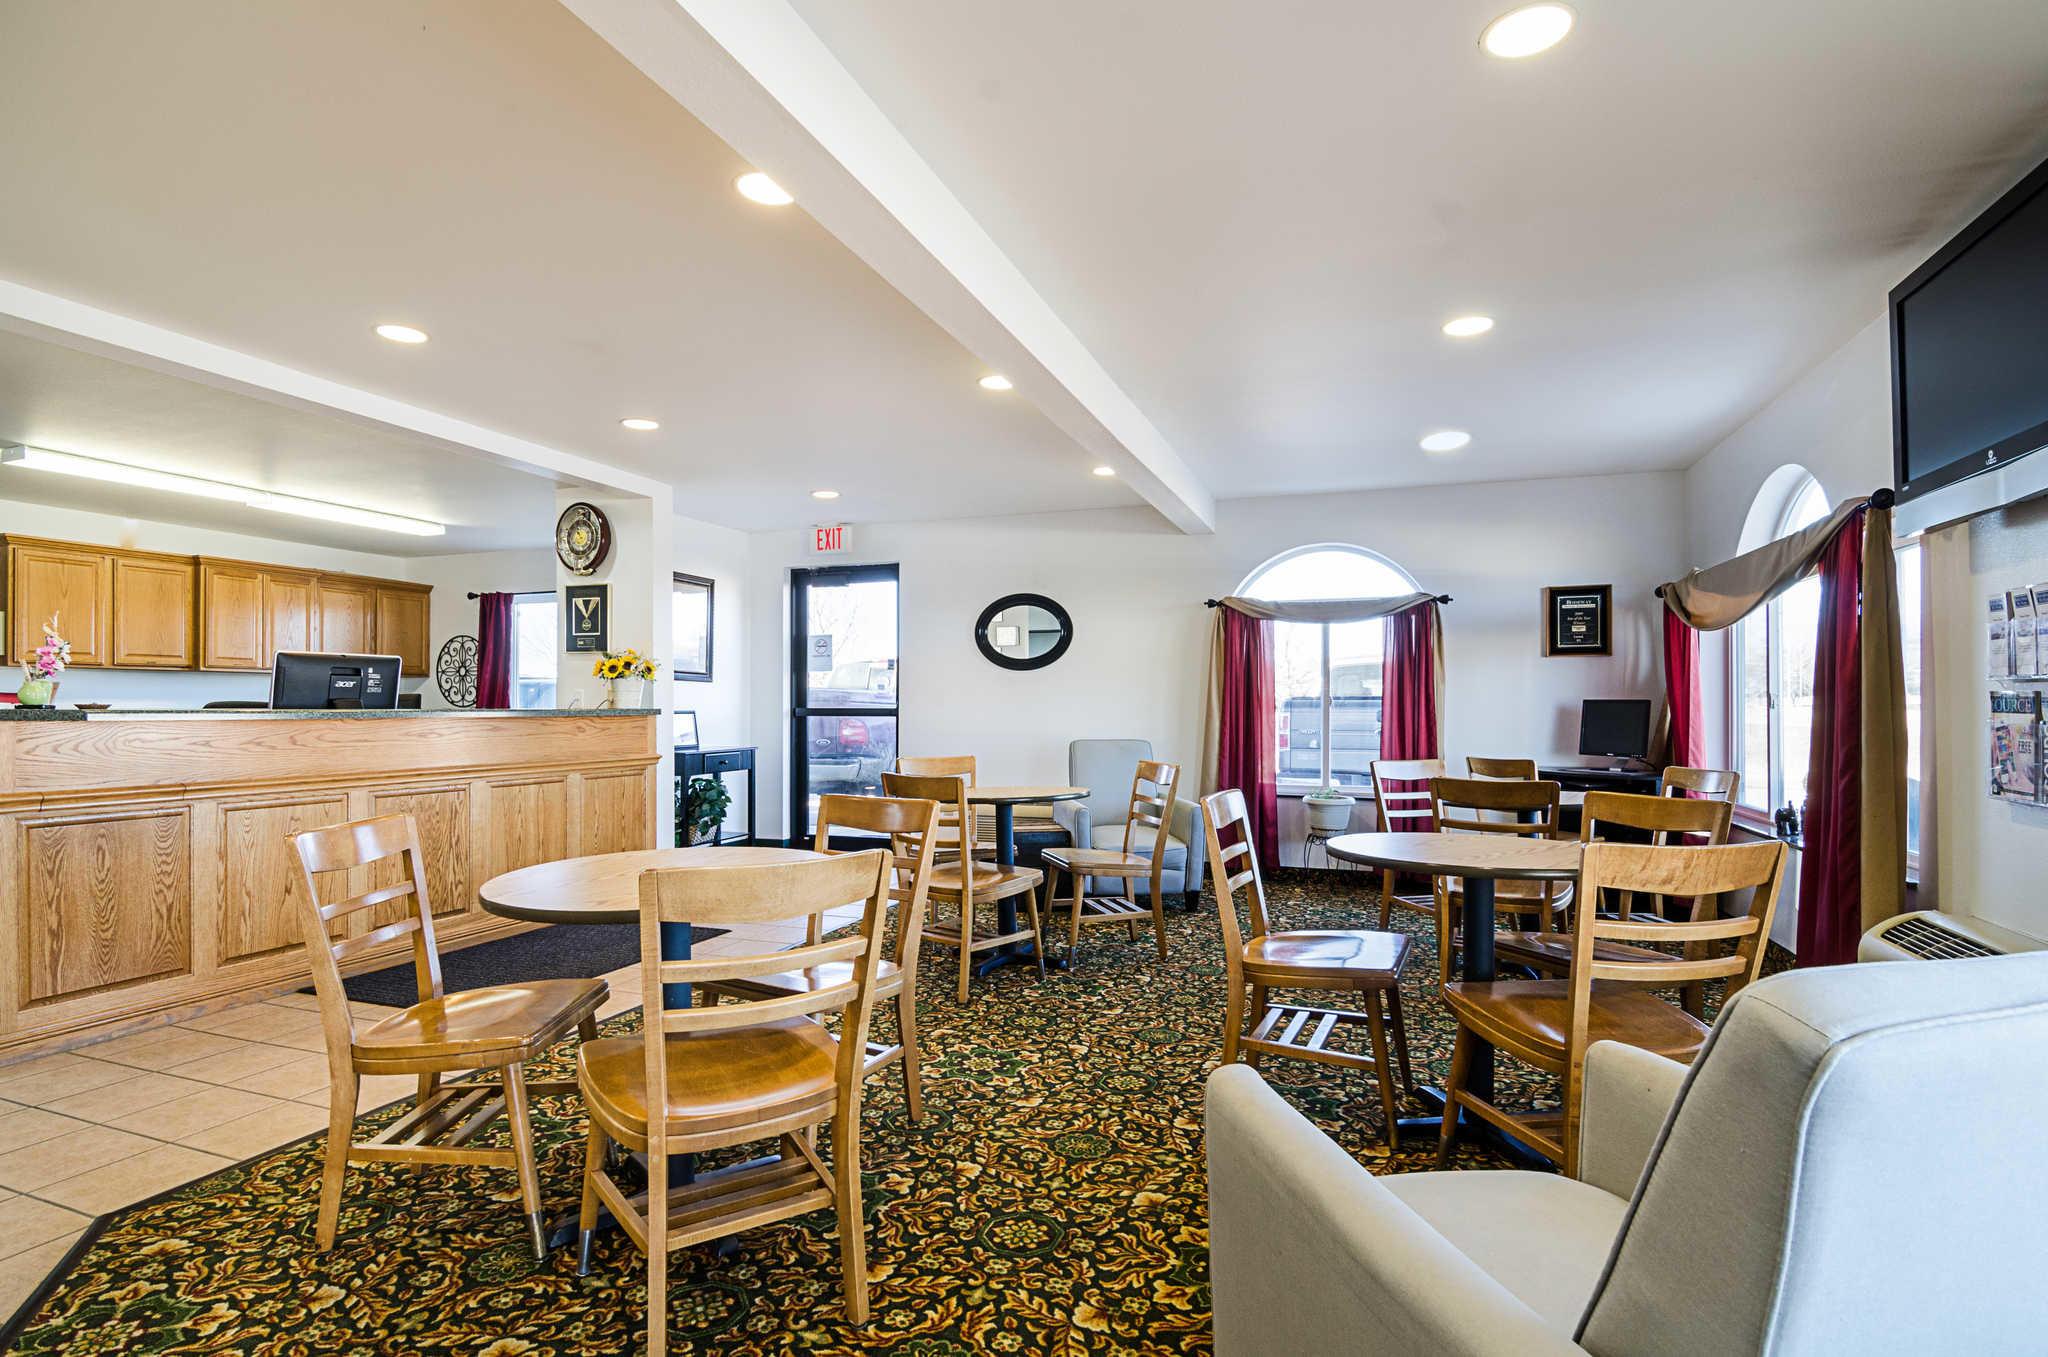 Rodeway Inn image 7